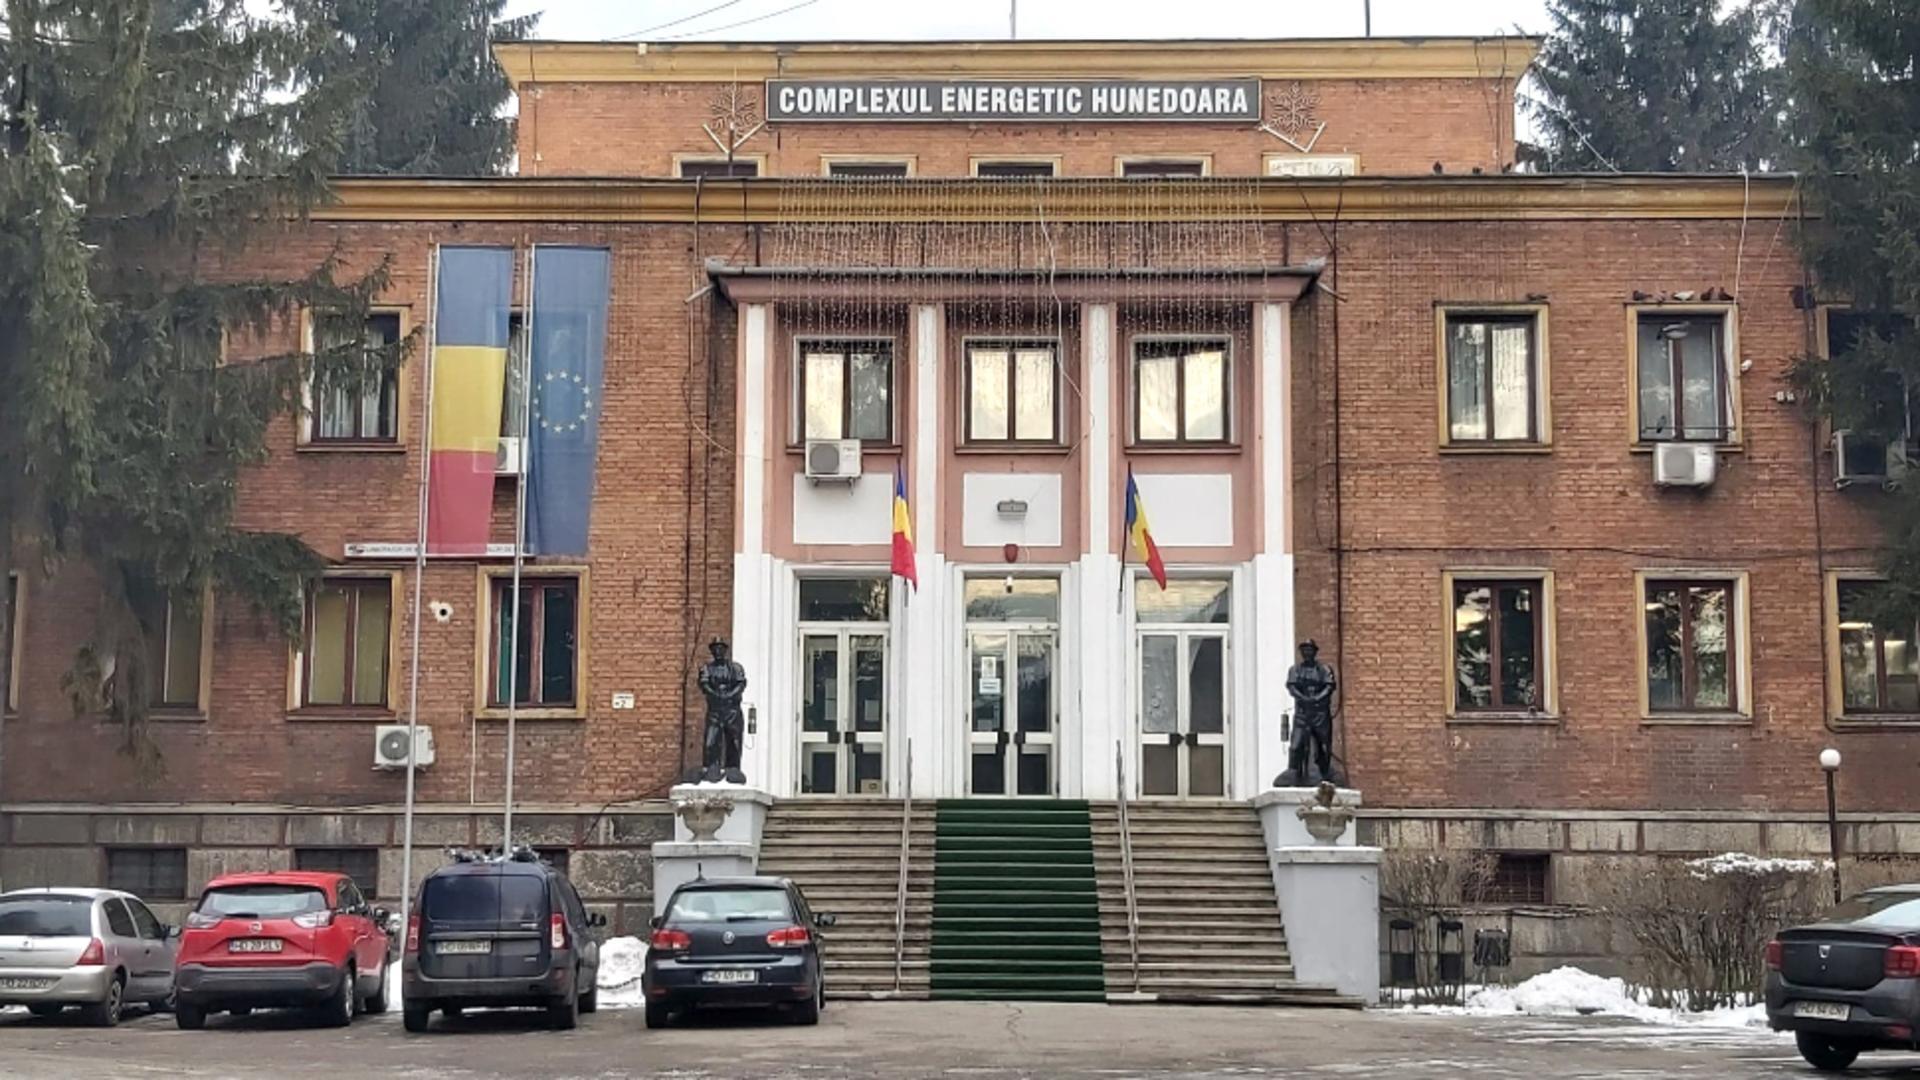 Complexul Energetic Hunedoara Foto: Mesagerul Hunedorean